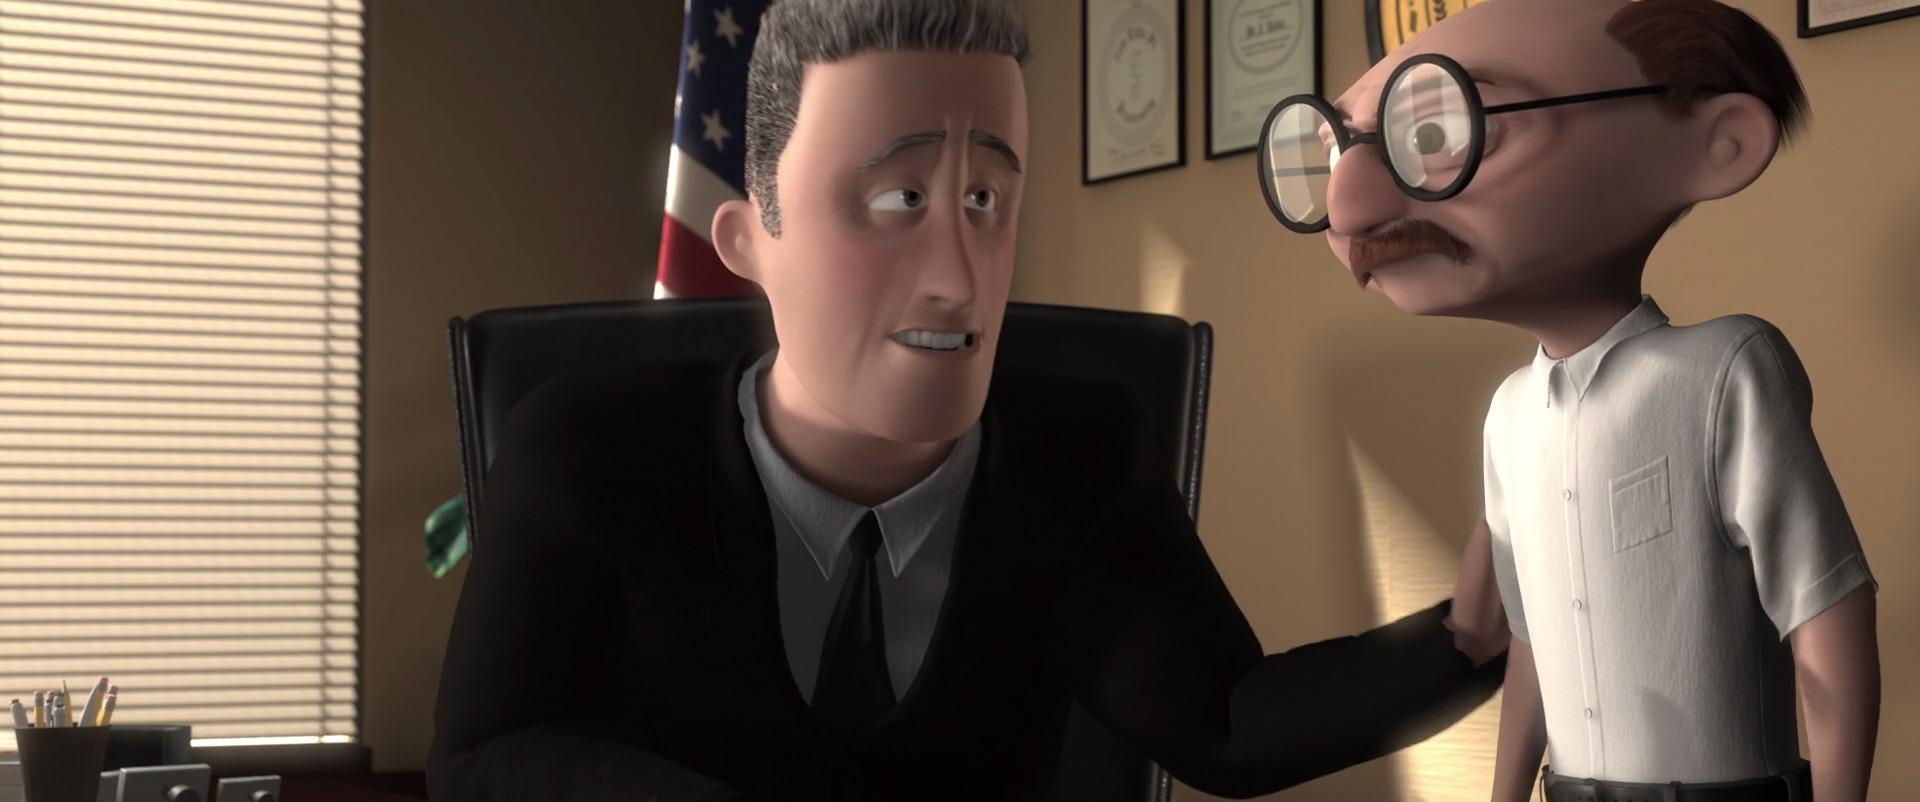 john walker pixar disney personnage character indestructibles incredibles